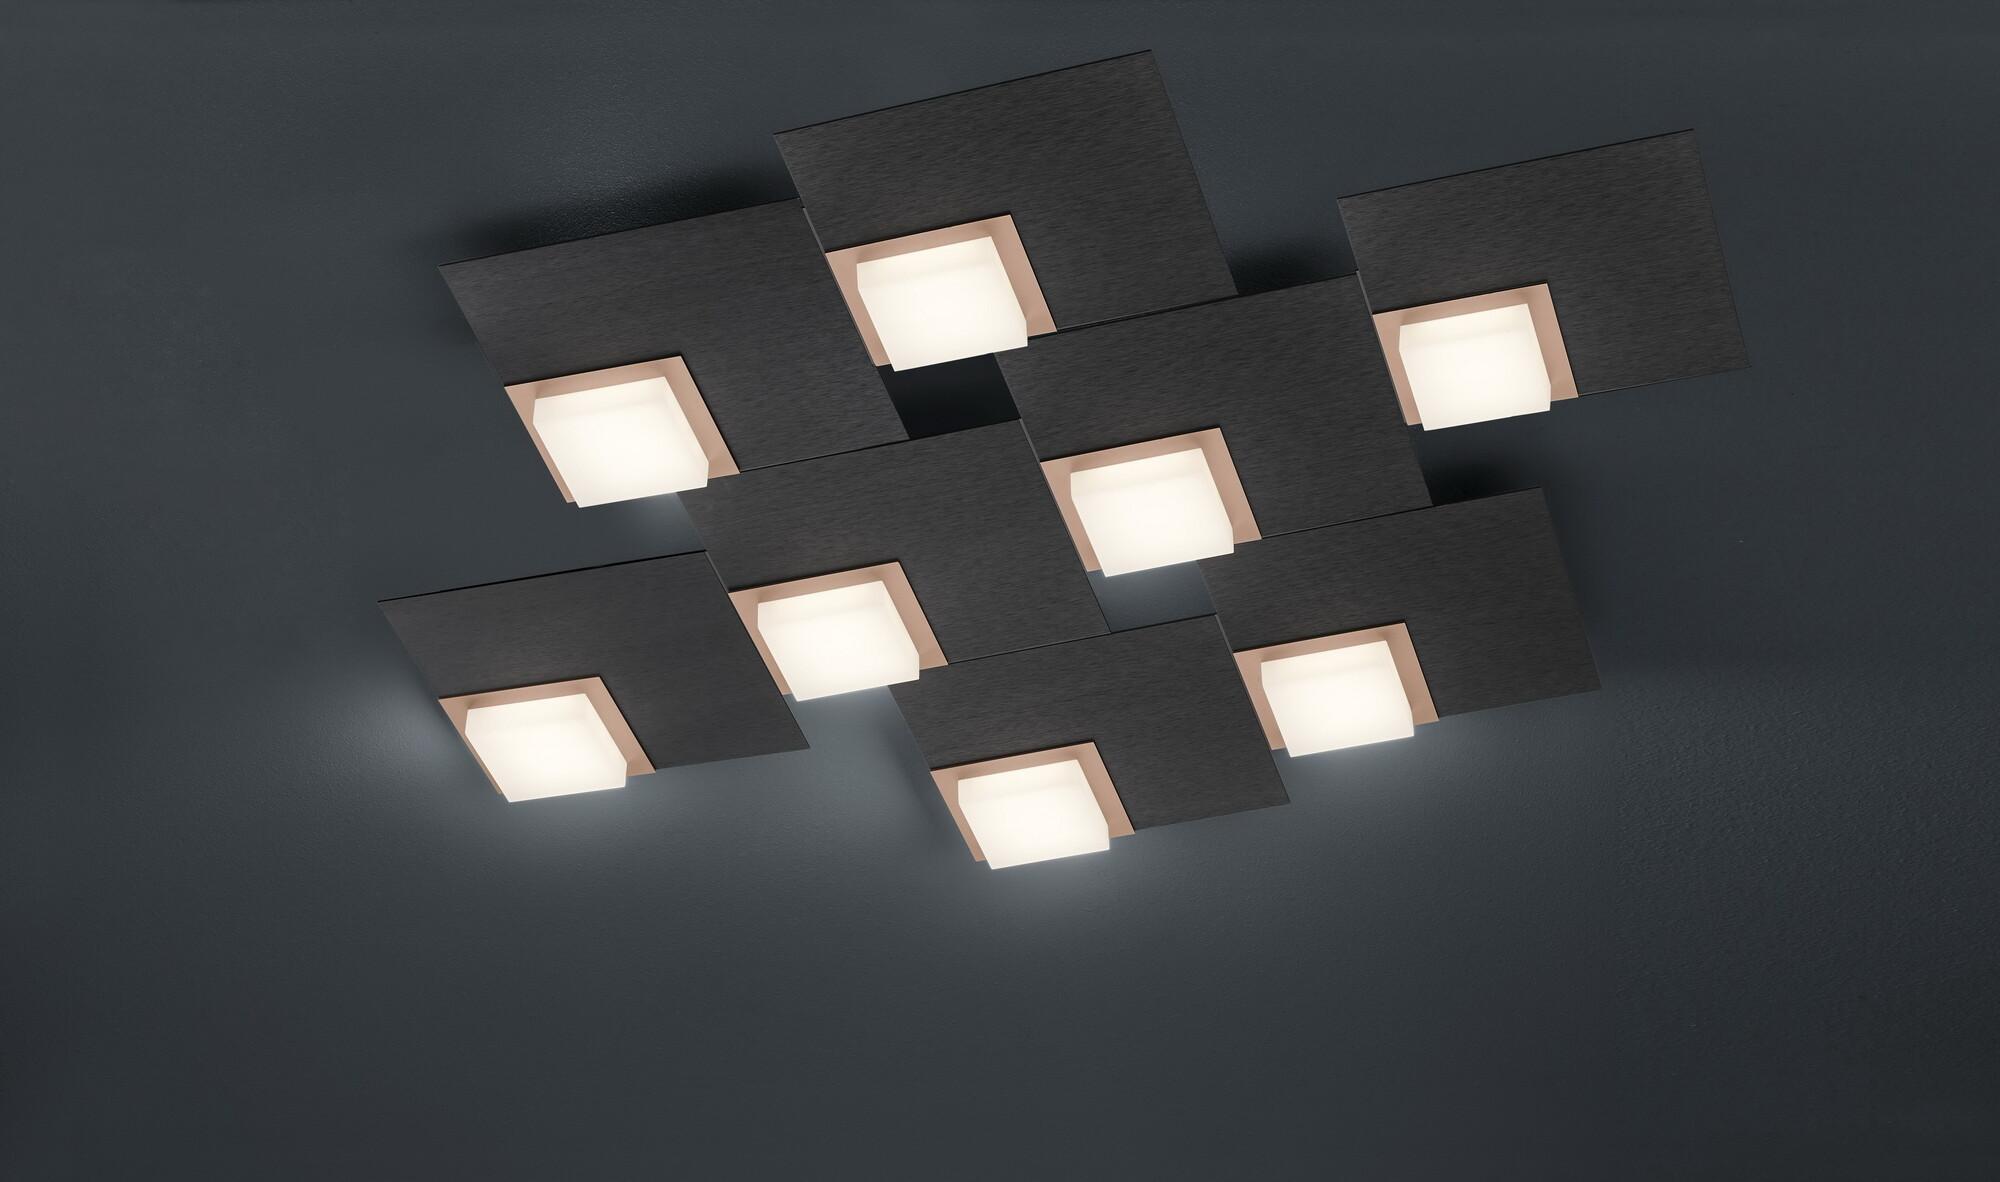 QUADRO Plafondlamp LED 8x 800lm Lichtgrijs